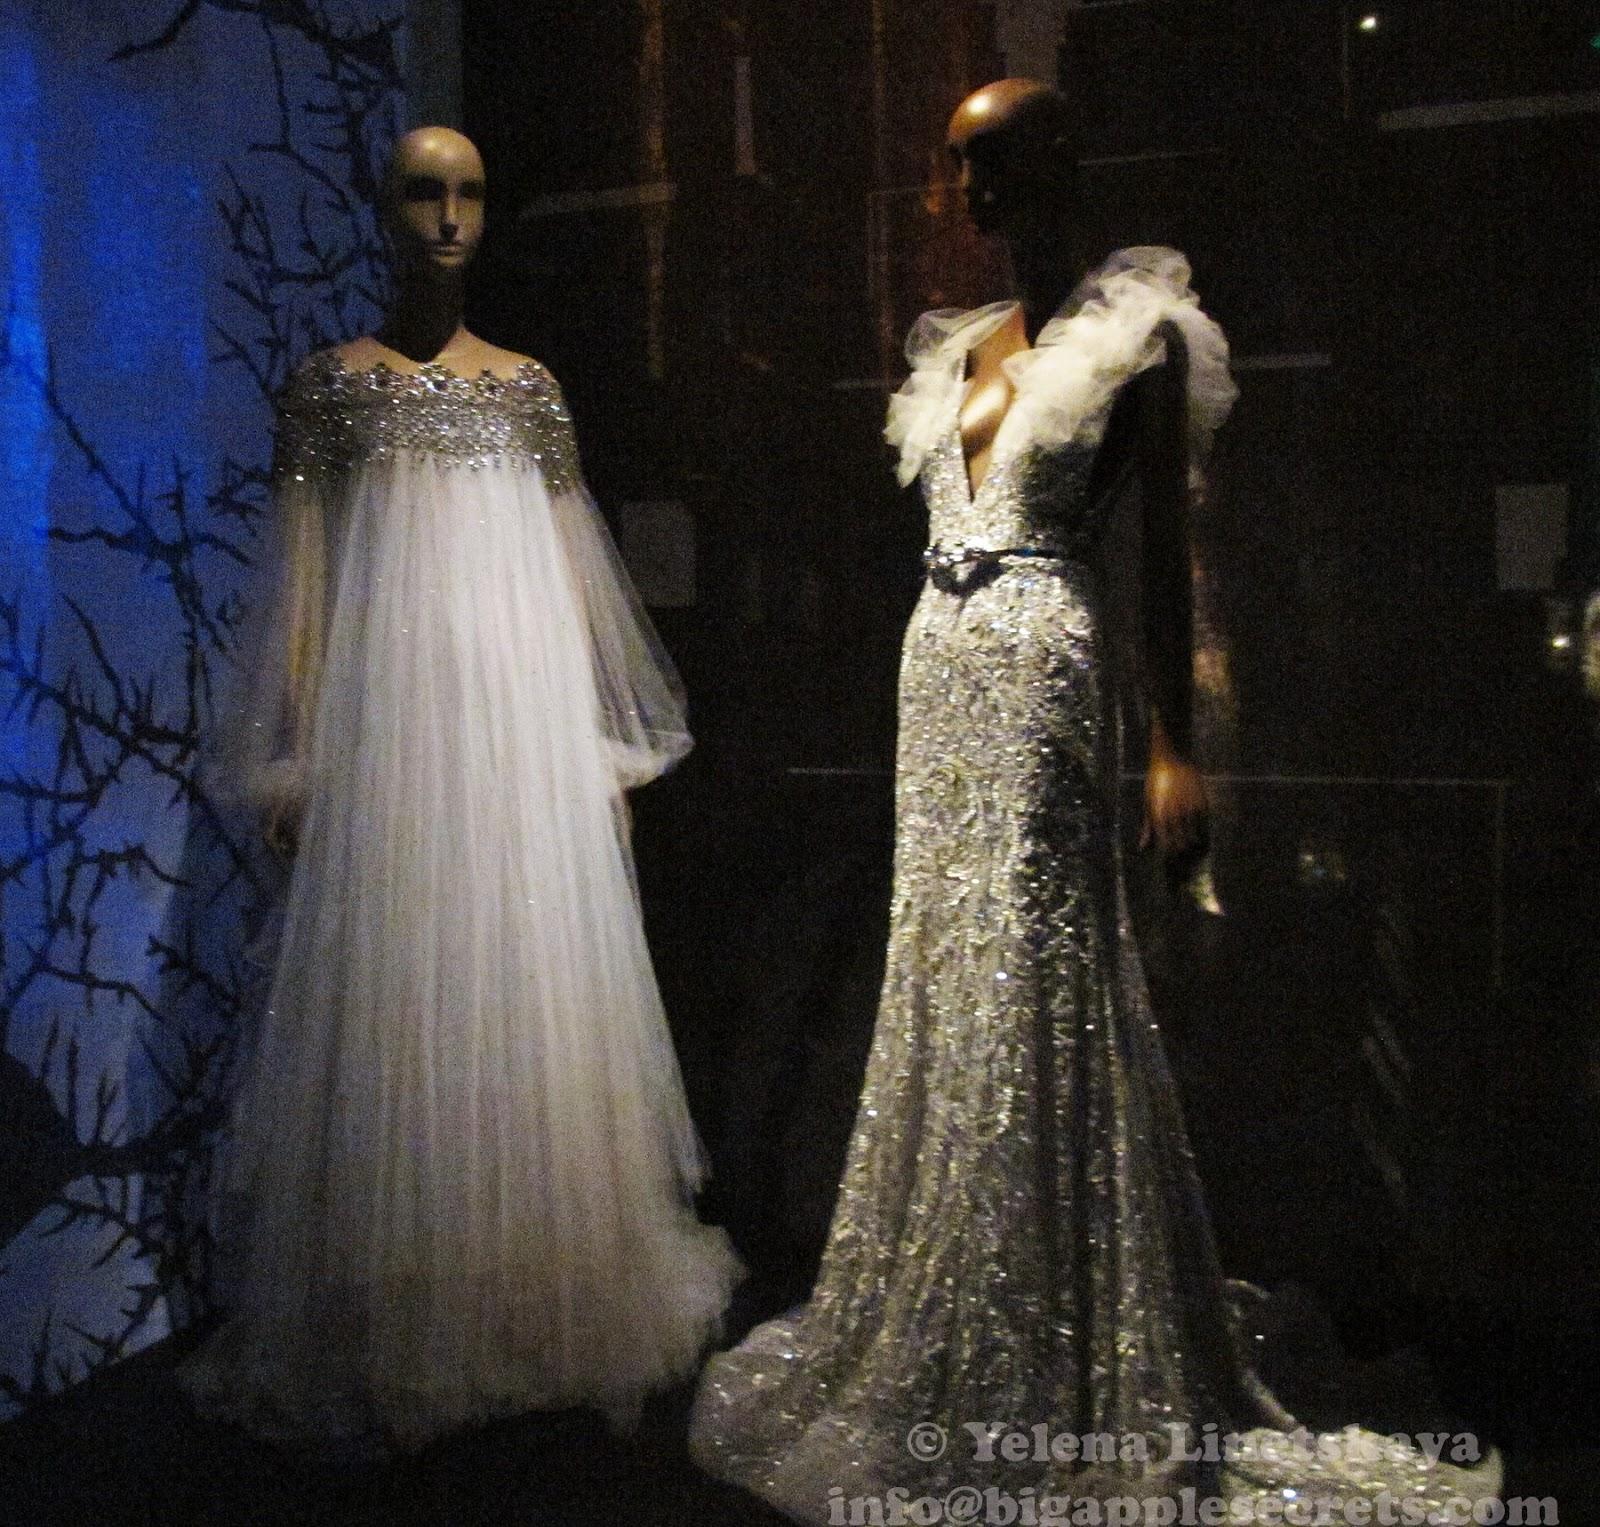 Big Apple Secrets: Fairy Tale Fashion at Fashion Institute of Technology